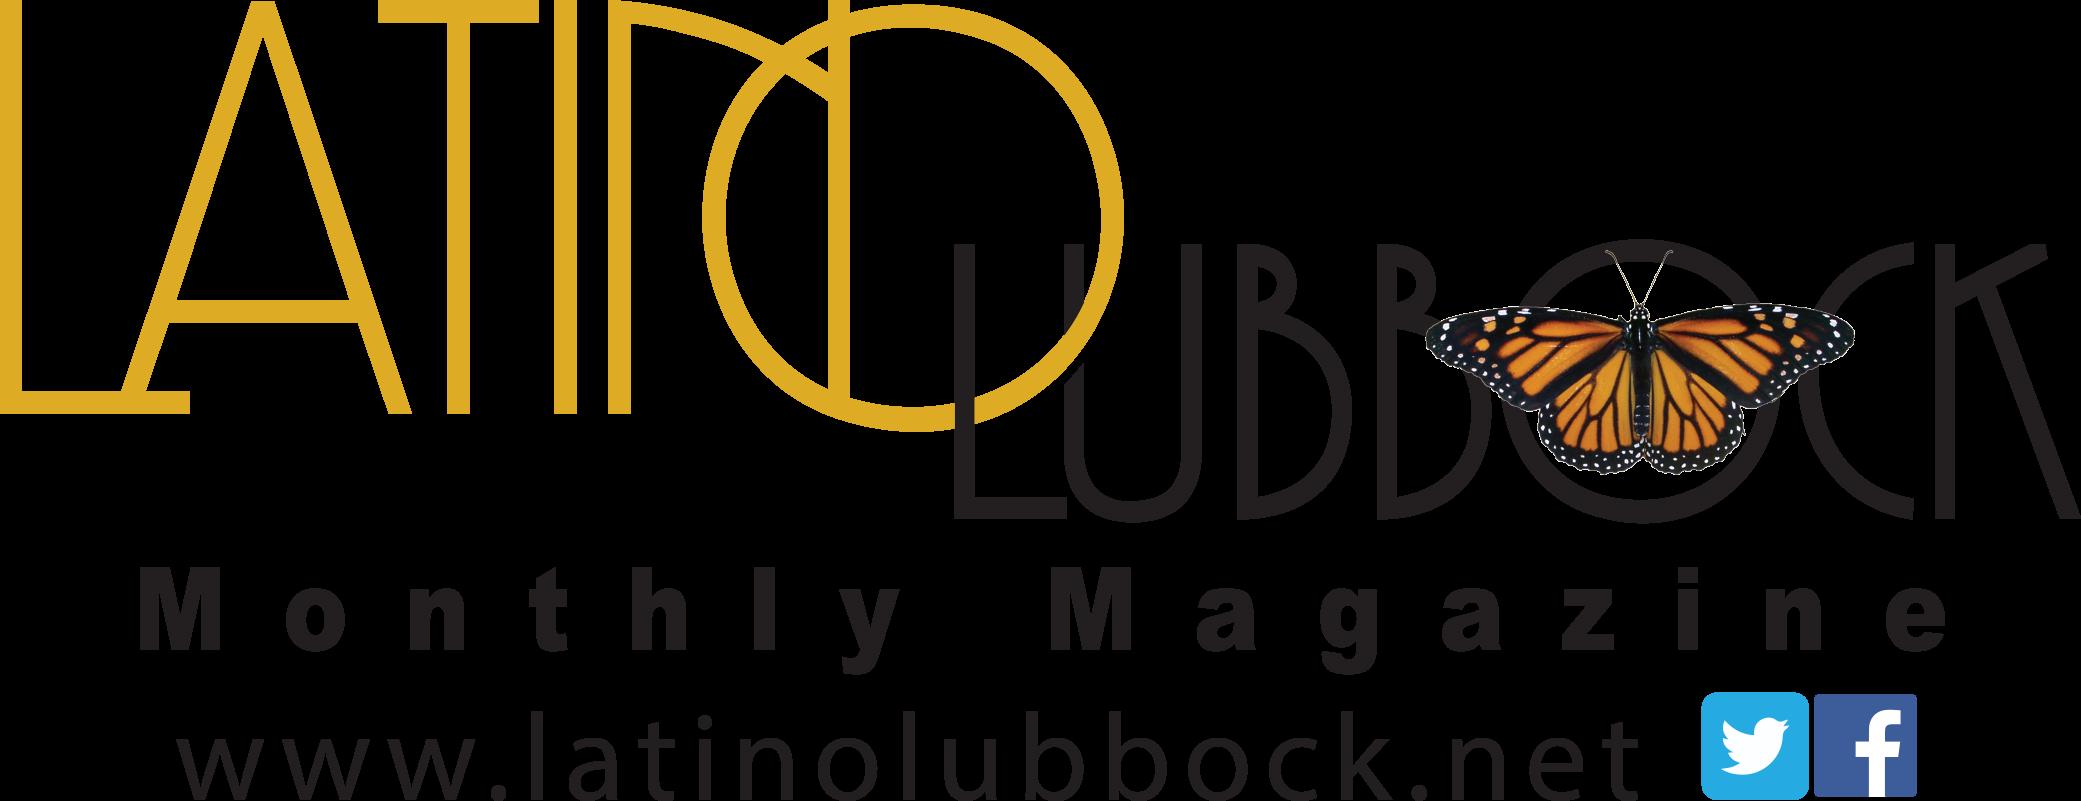 Magazine clipart tabloid. Latinolubbock advertising